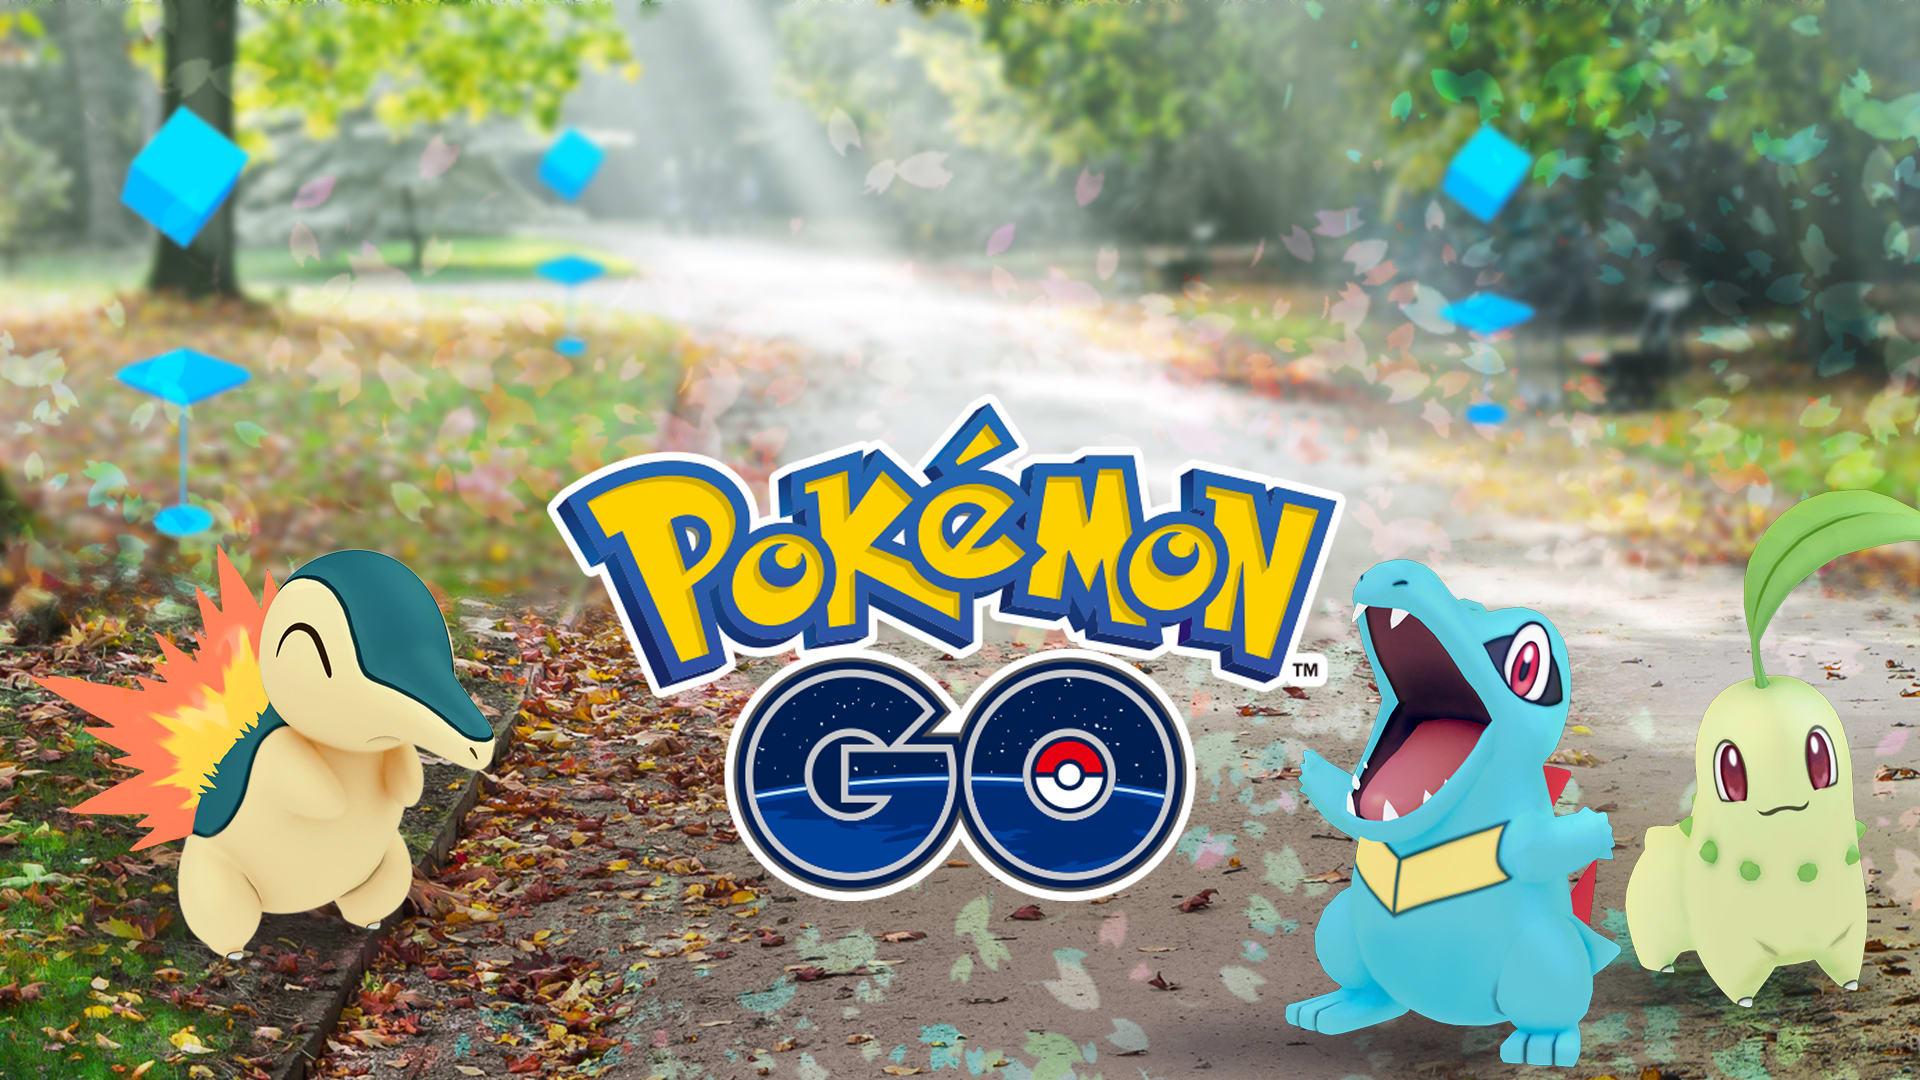 Pokemon GO walking rewards are here